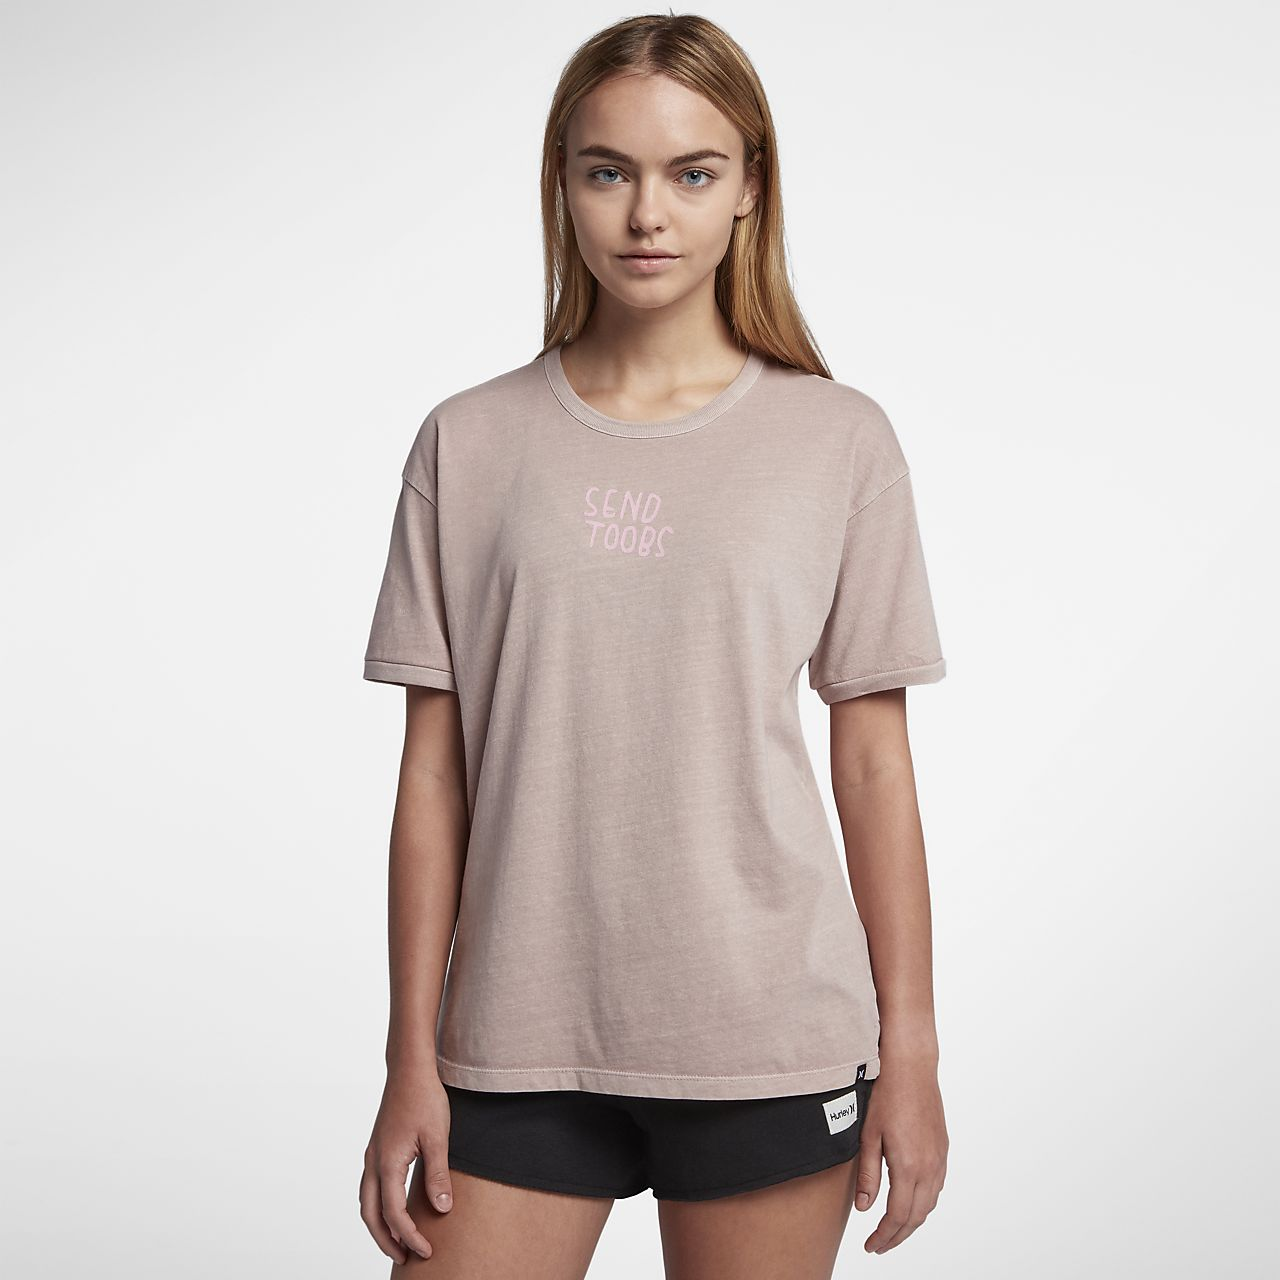 Hurley Send Toobs Wash Ringer Women's T-Shirt